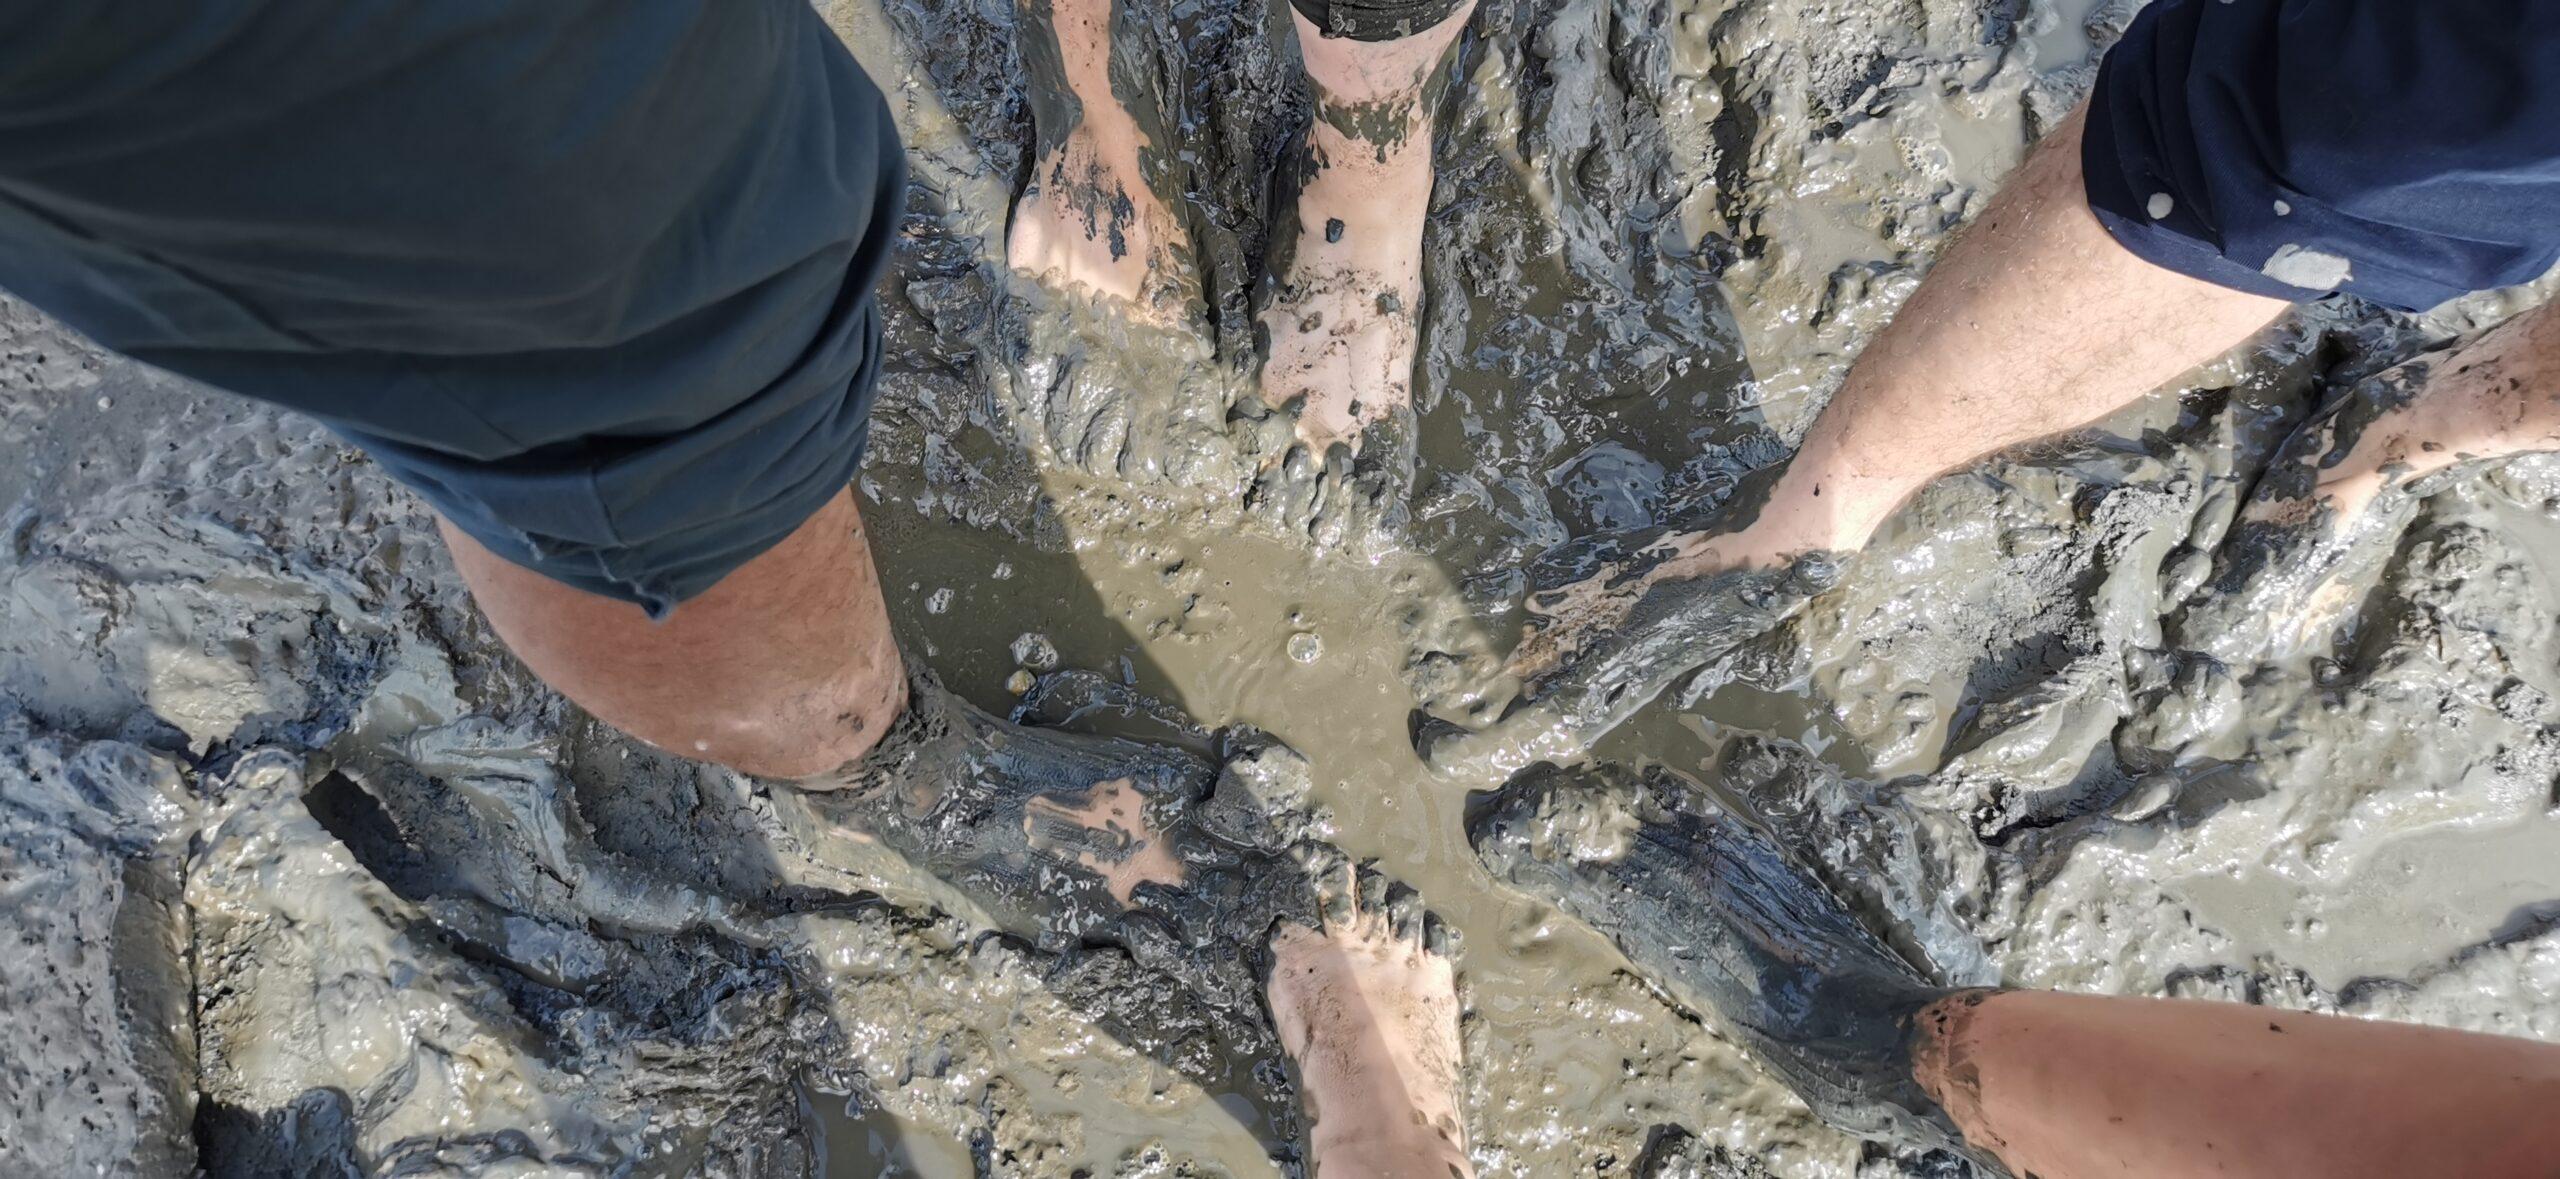 Nackte Füße im matschigen Watt.